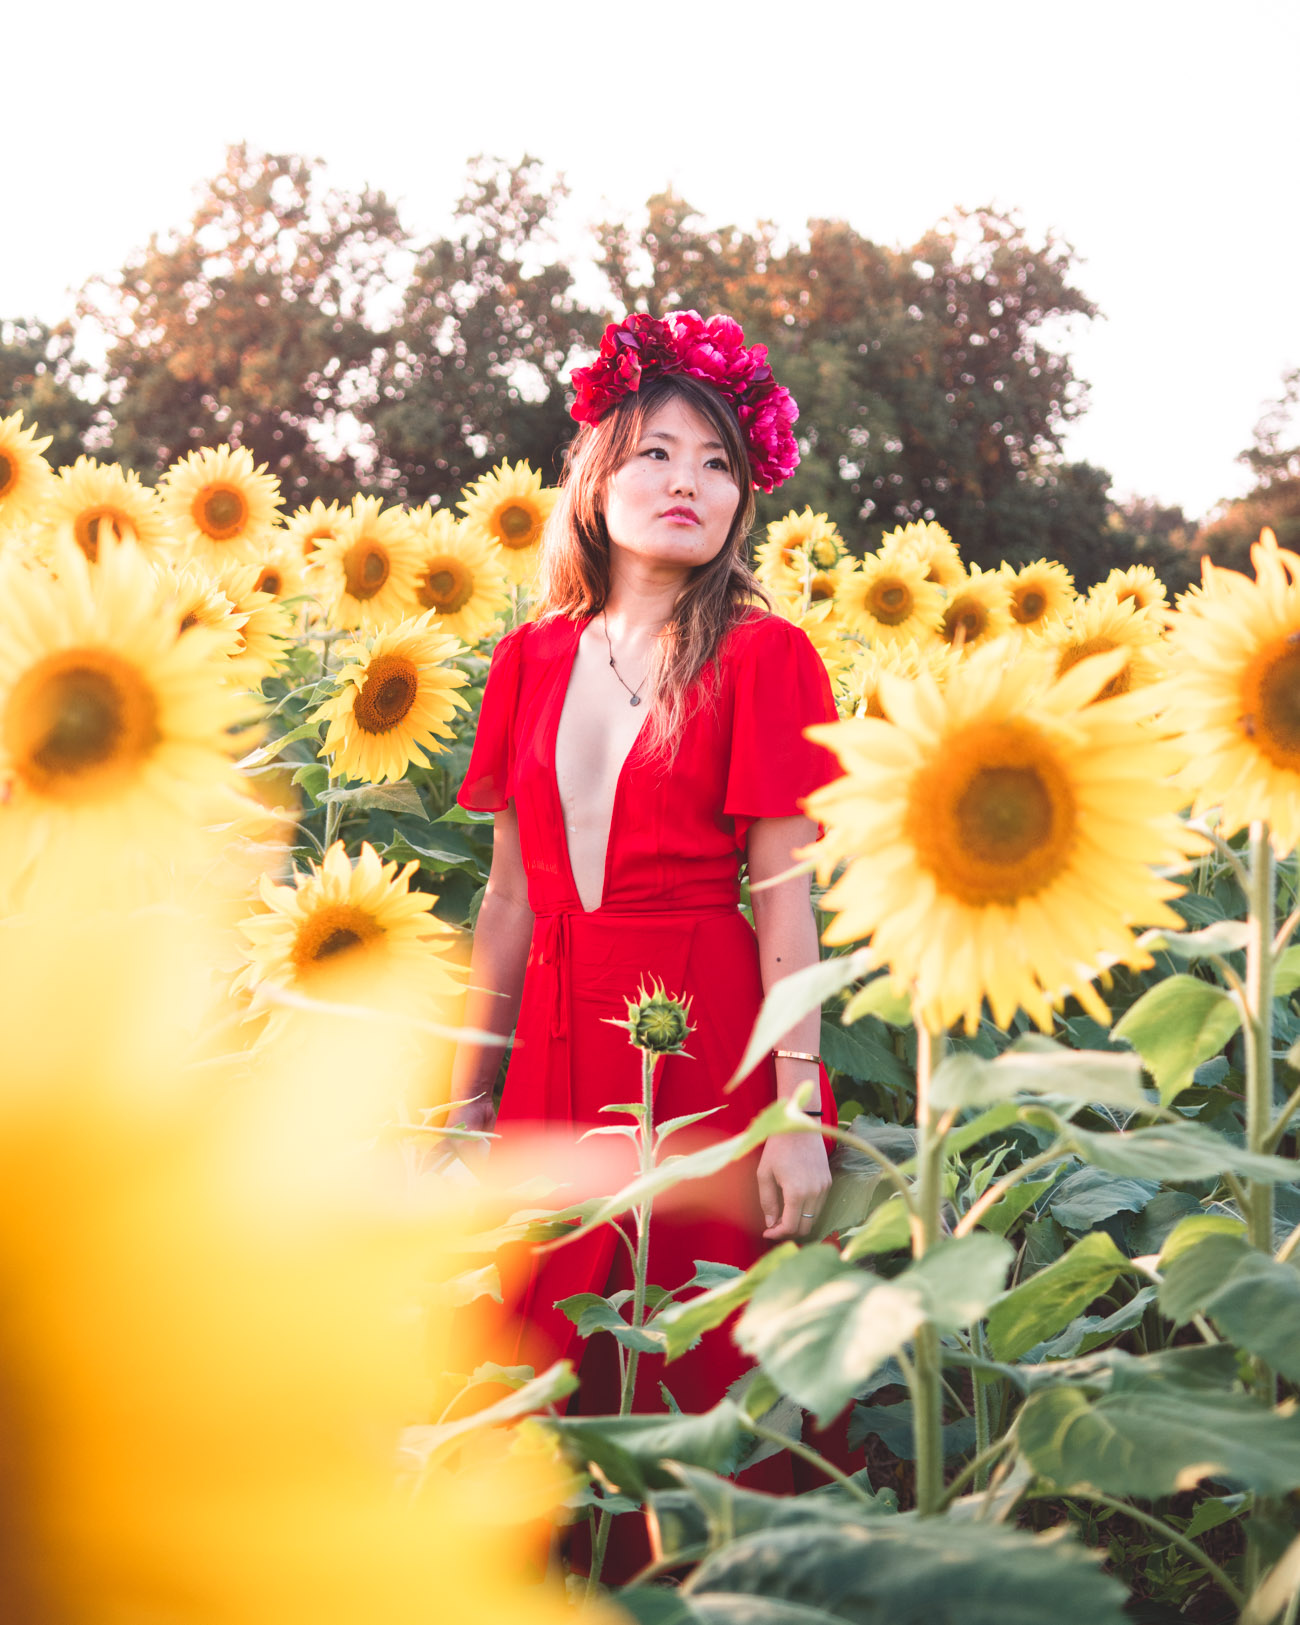 jerrettsville sunflowers